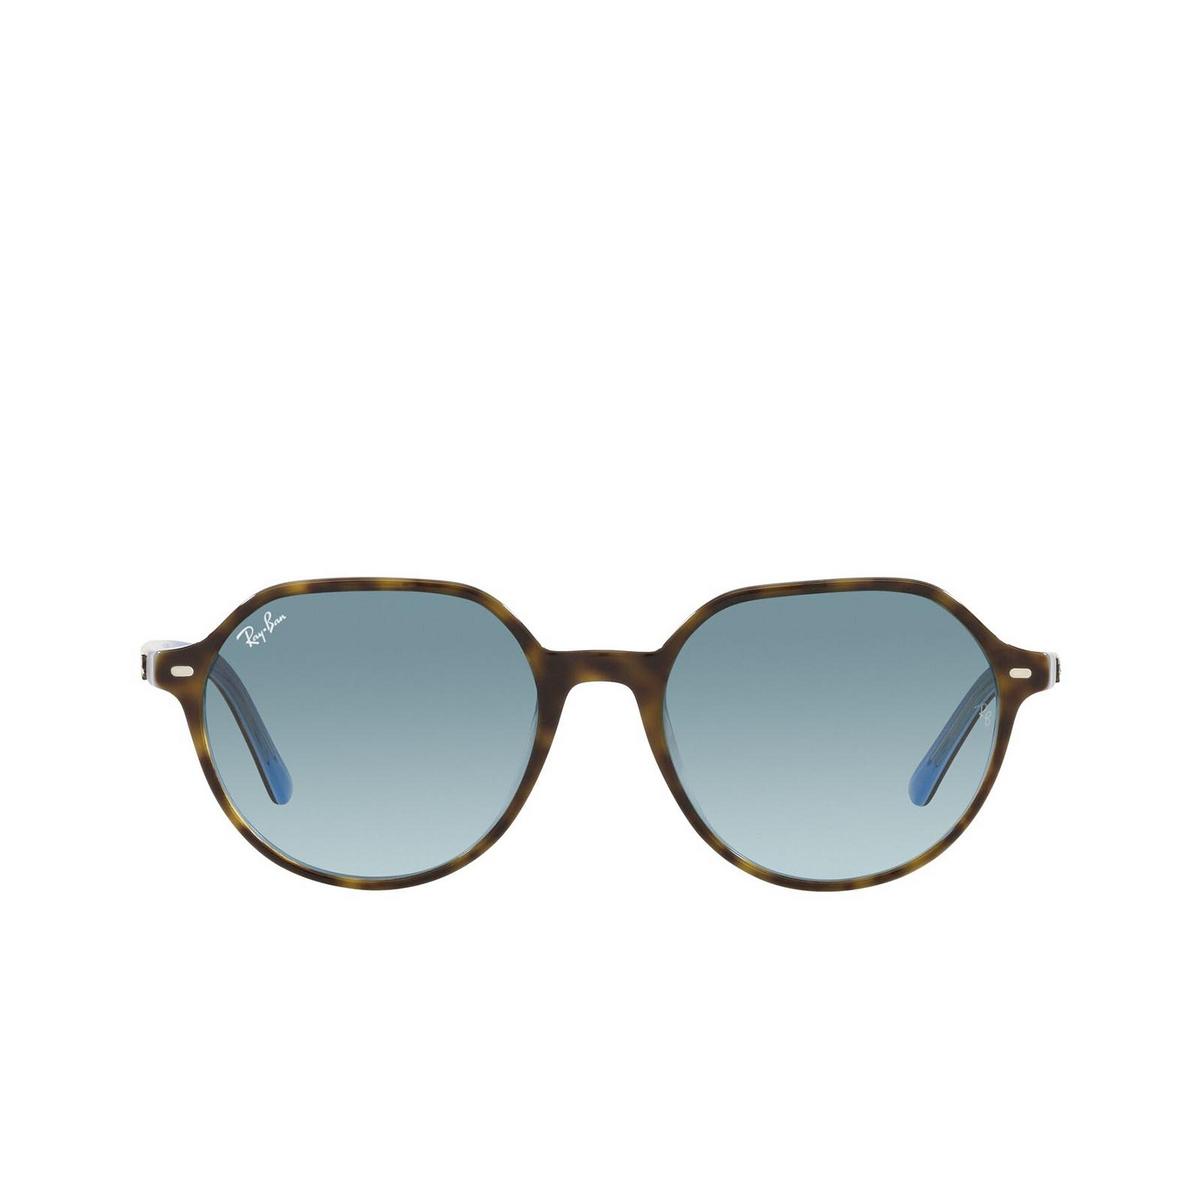 Ray-Ban® Irregular Sunglasses: Thalia RB2195 color Havana On Light Blue 13163M - 1/3.